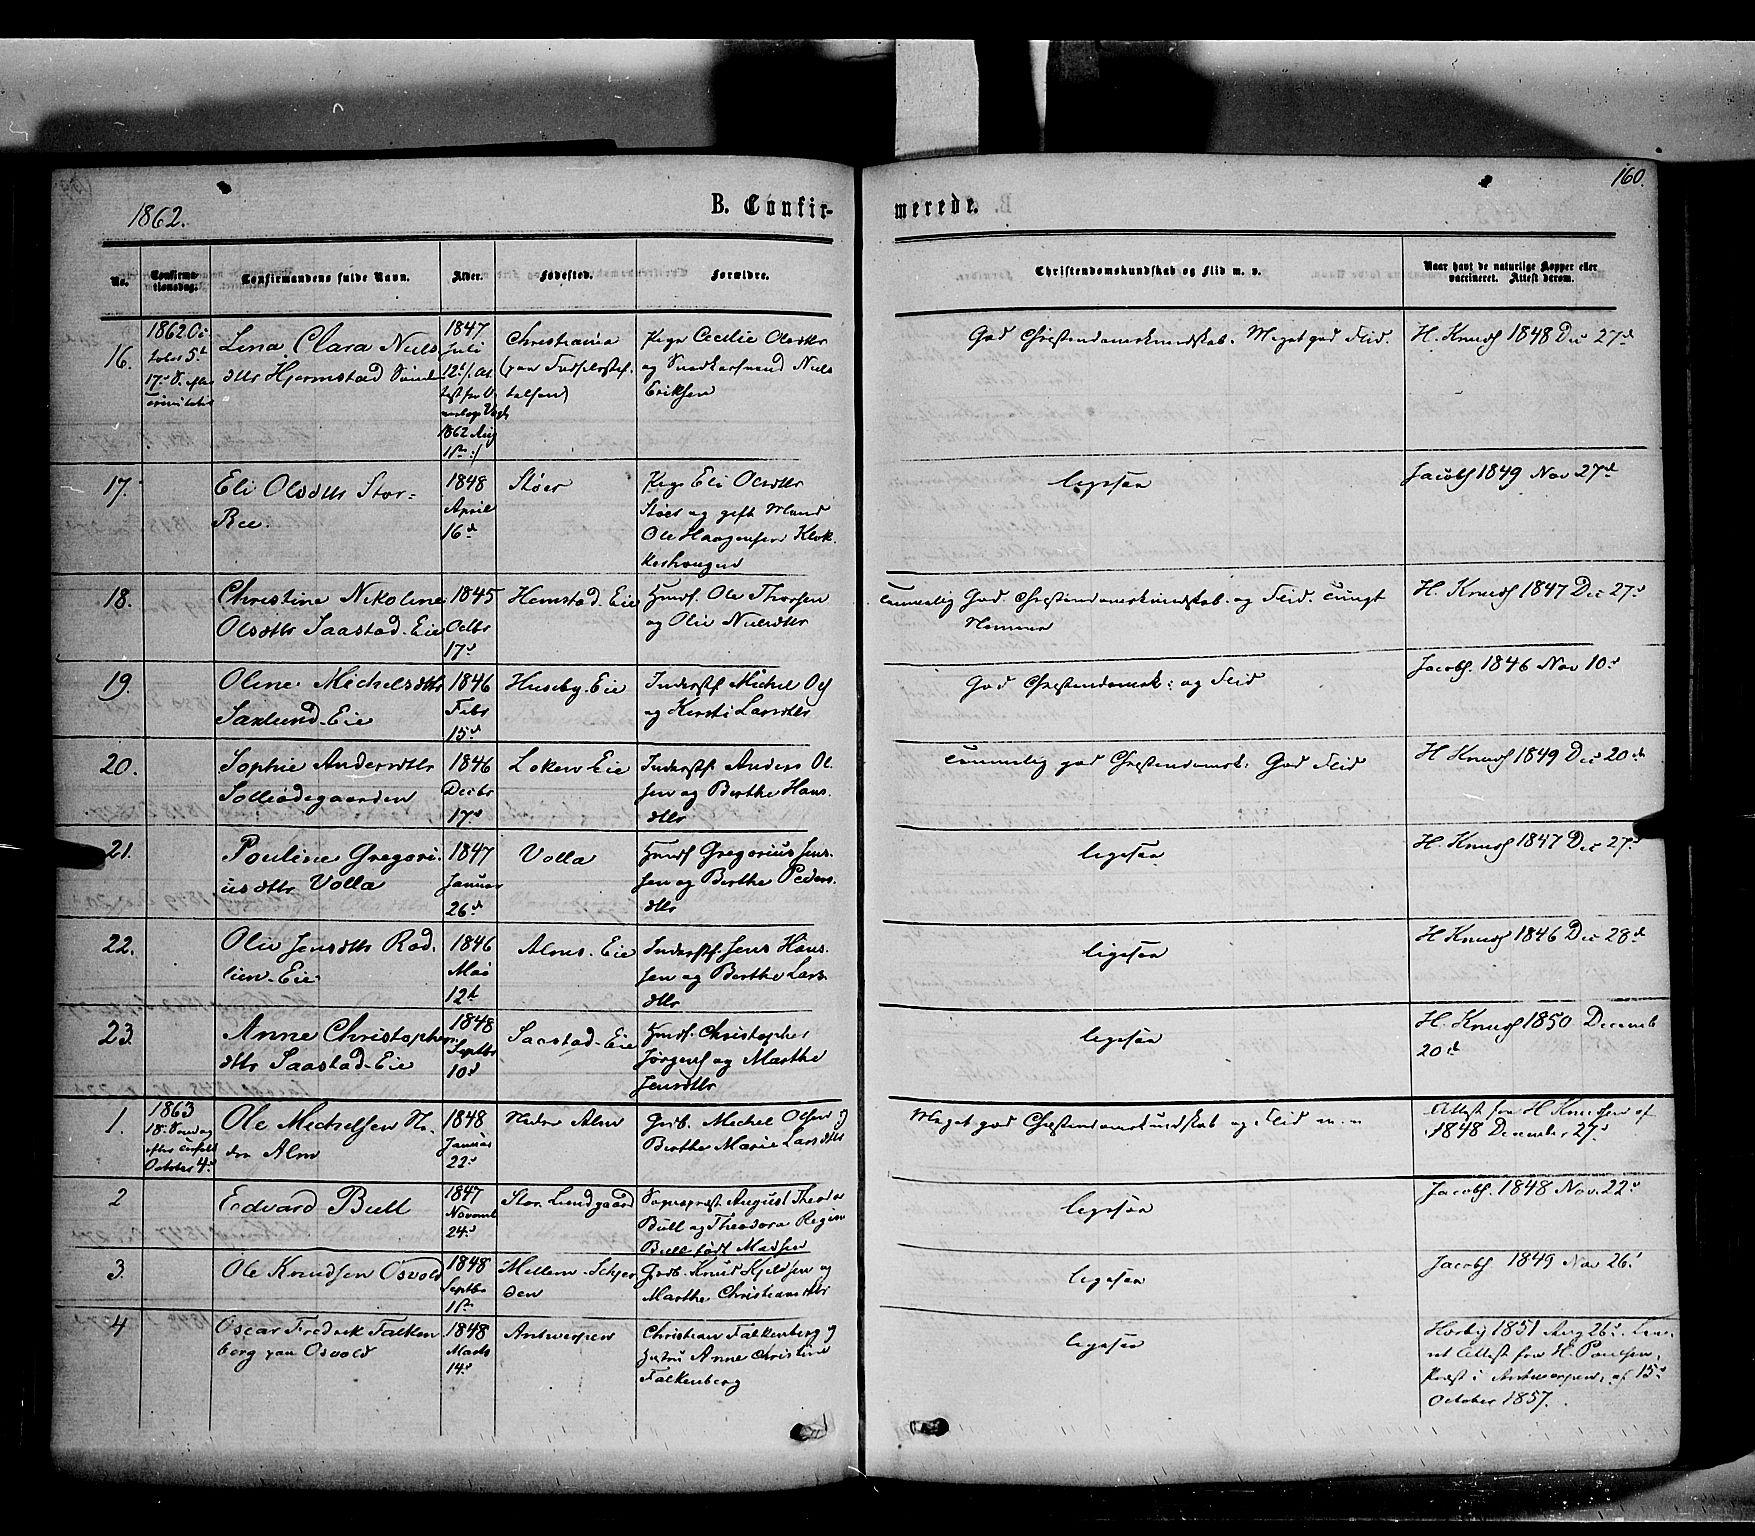 SAH, Stange prestekontor, K/L0013: Ministerialbok nr. 13, 1862-1879, s. 160